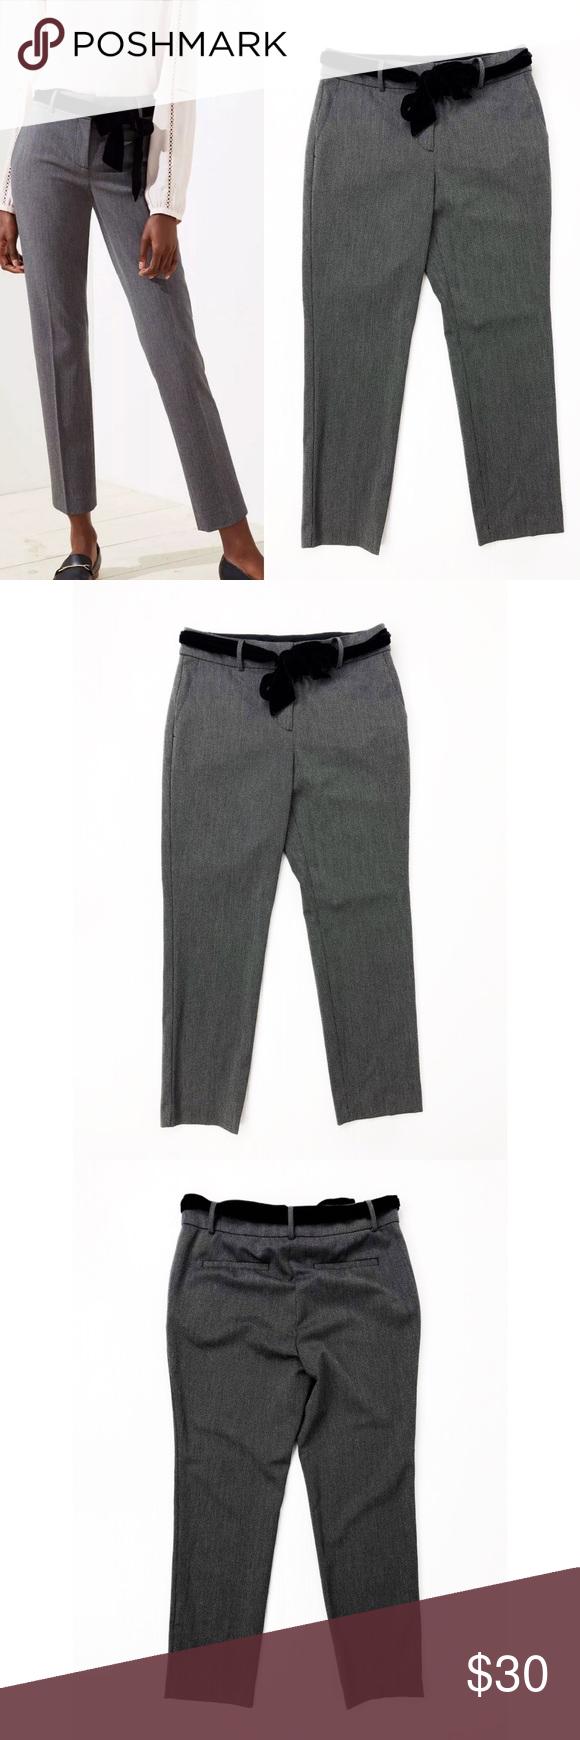 💜Loft Marisa Black Pattern Velvet Waist Tie Pants Loft  Size 6  Style: Marisa  Waist tie is black velvet  Excellent pre loved condition  Ships fast!  W9 #0380 LOFT Pants Ankle & Cropped